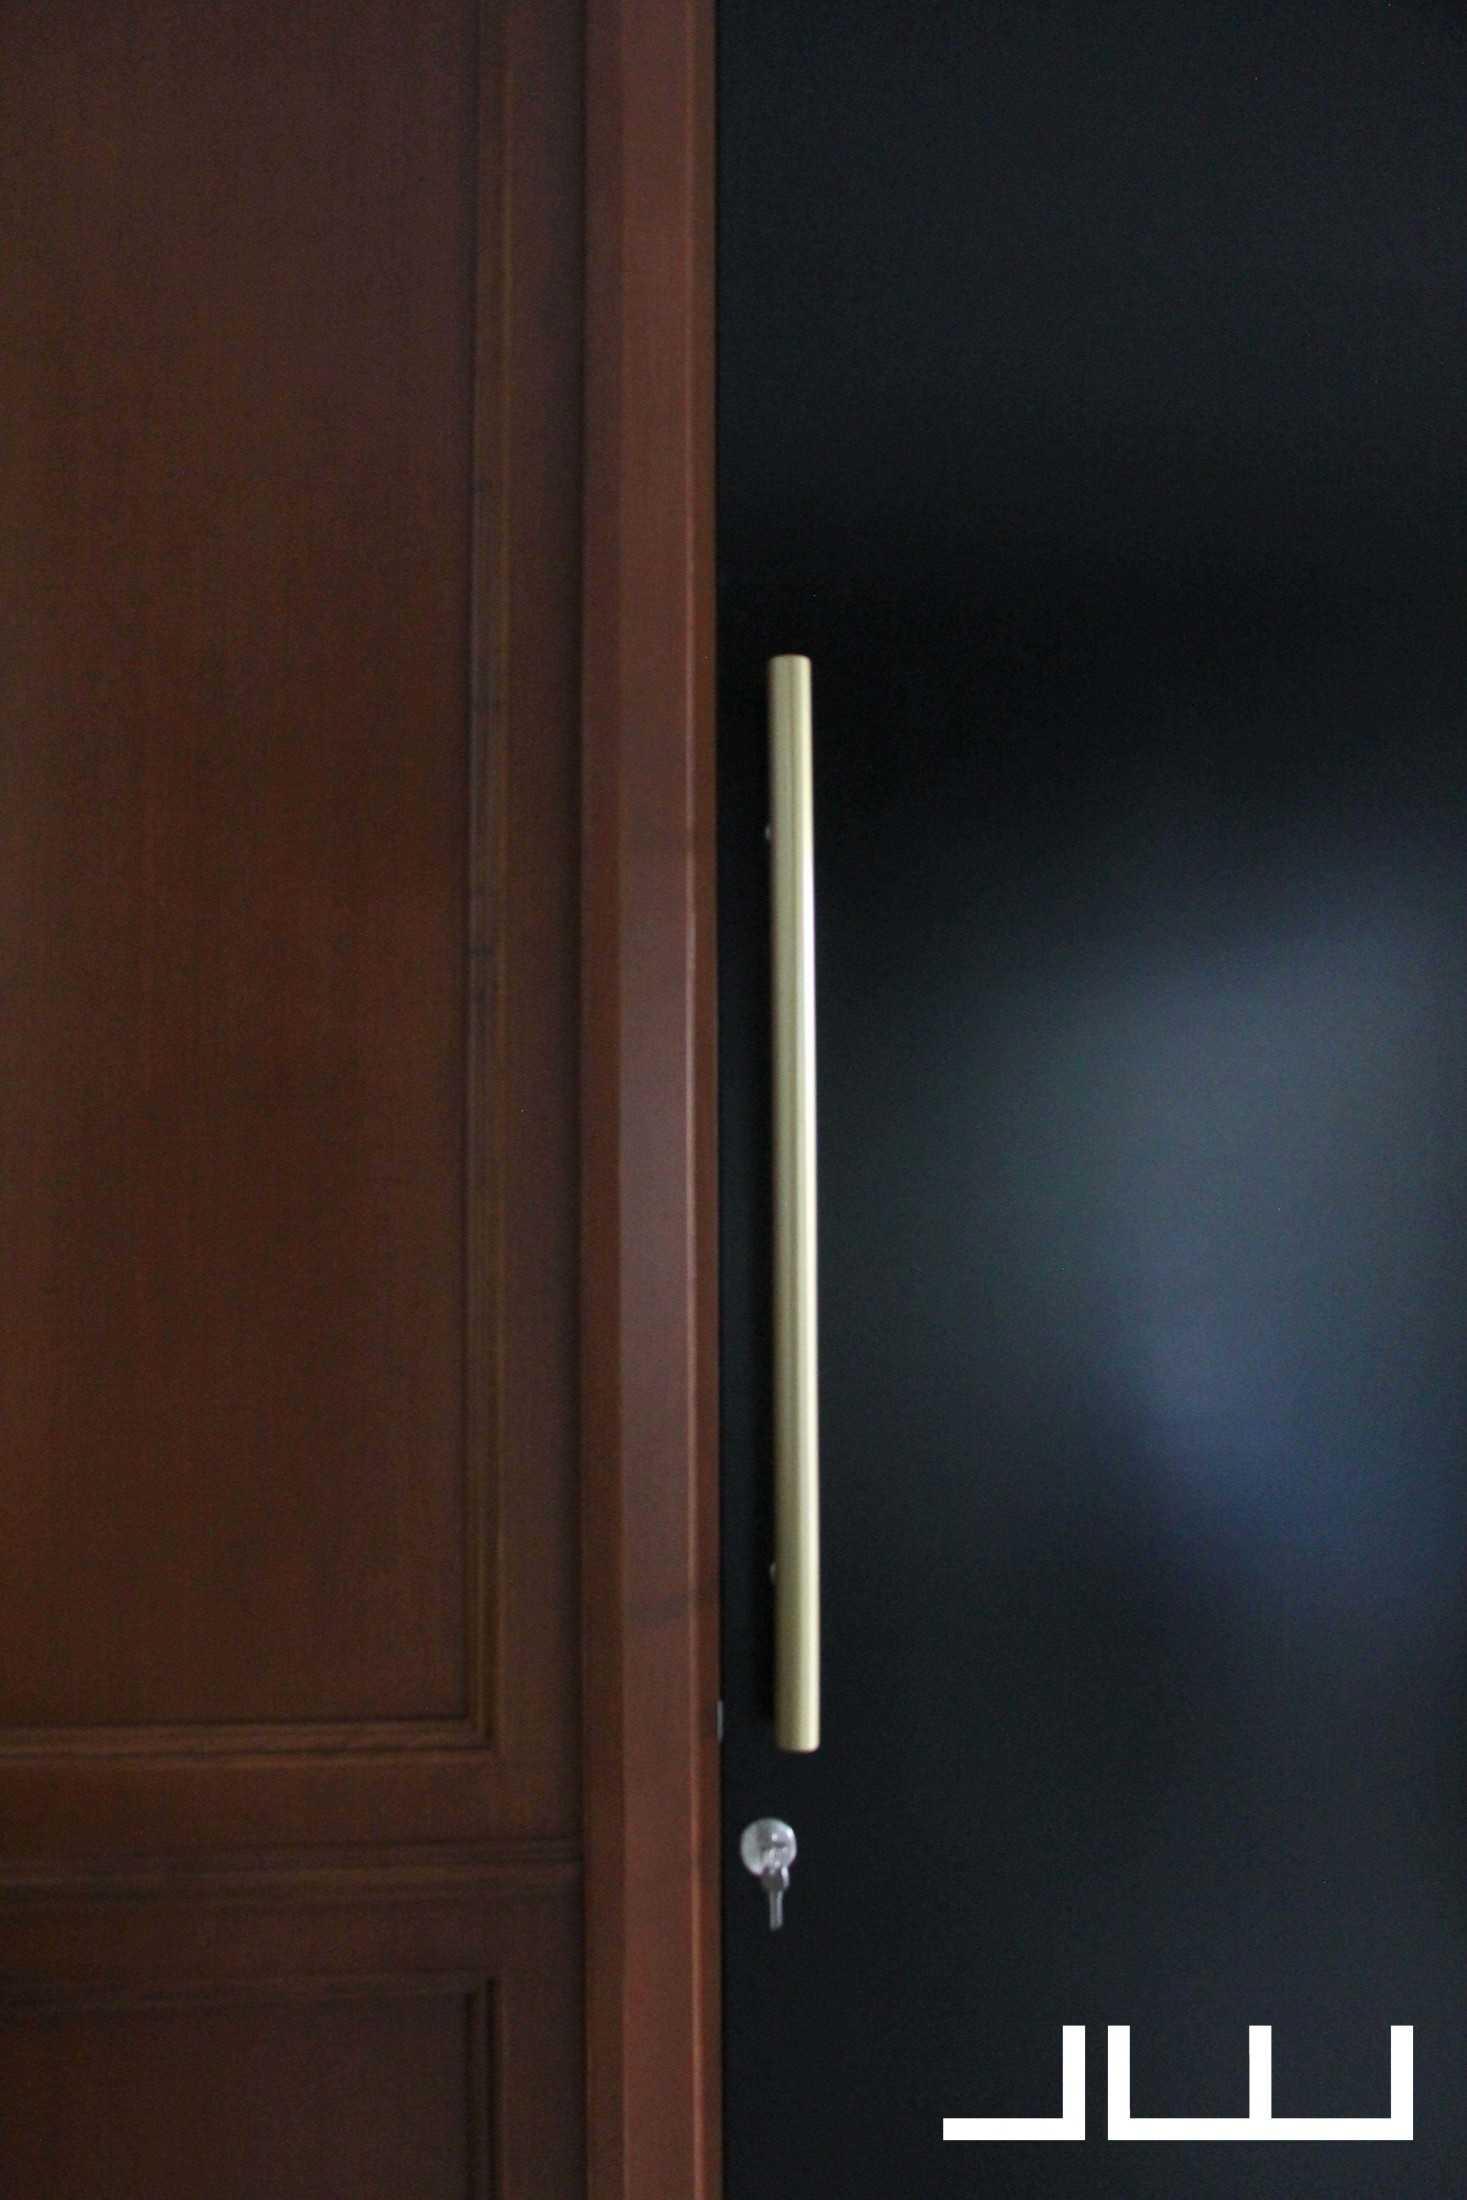 Jw Consultant Aac Jl. Joglo Raya, Rt.2/rw.7, Petukangan Utara, Pesanggrahan, Kota Jakarta Selatan, Daerah Khusus Ibukota Jakarta 12260, Indonesia Jl. Joglo Raya, Rt.2/rw.7, Petukangan Utara, Pesanggrahan, Kota Jakarta Selatan, Daerah Khusus Ibukota Jakarta 12260, Indonesia Jw-Consultant-Aac  60698